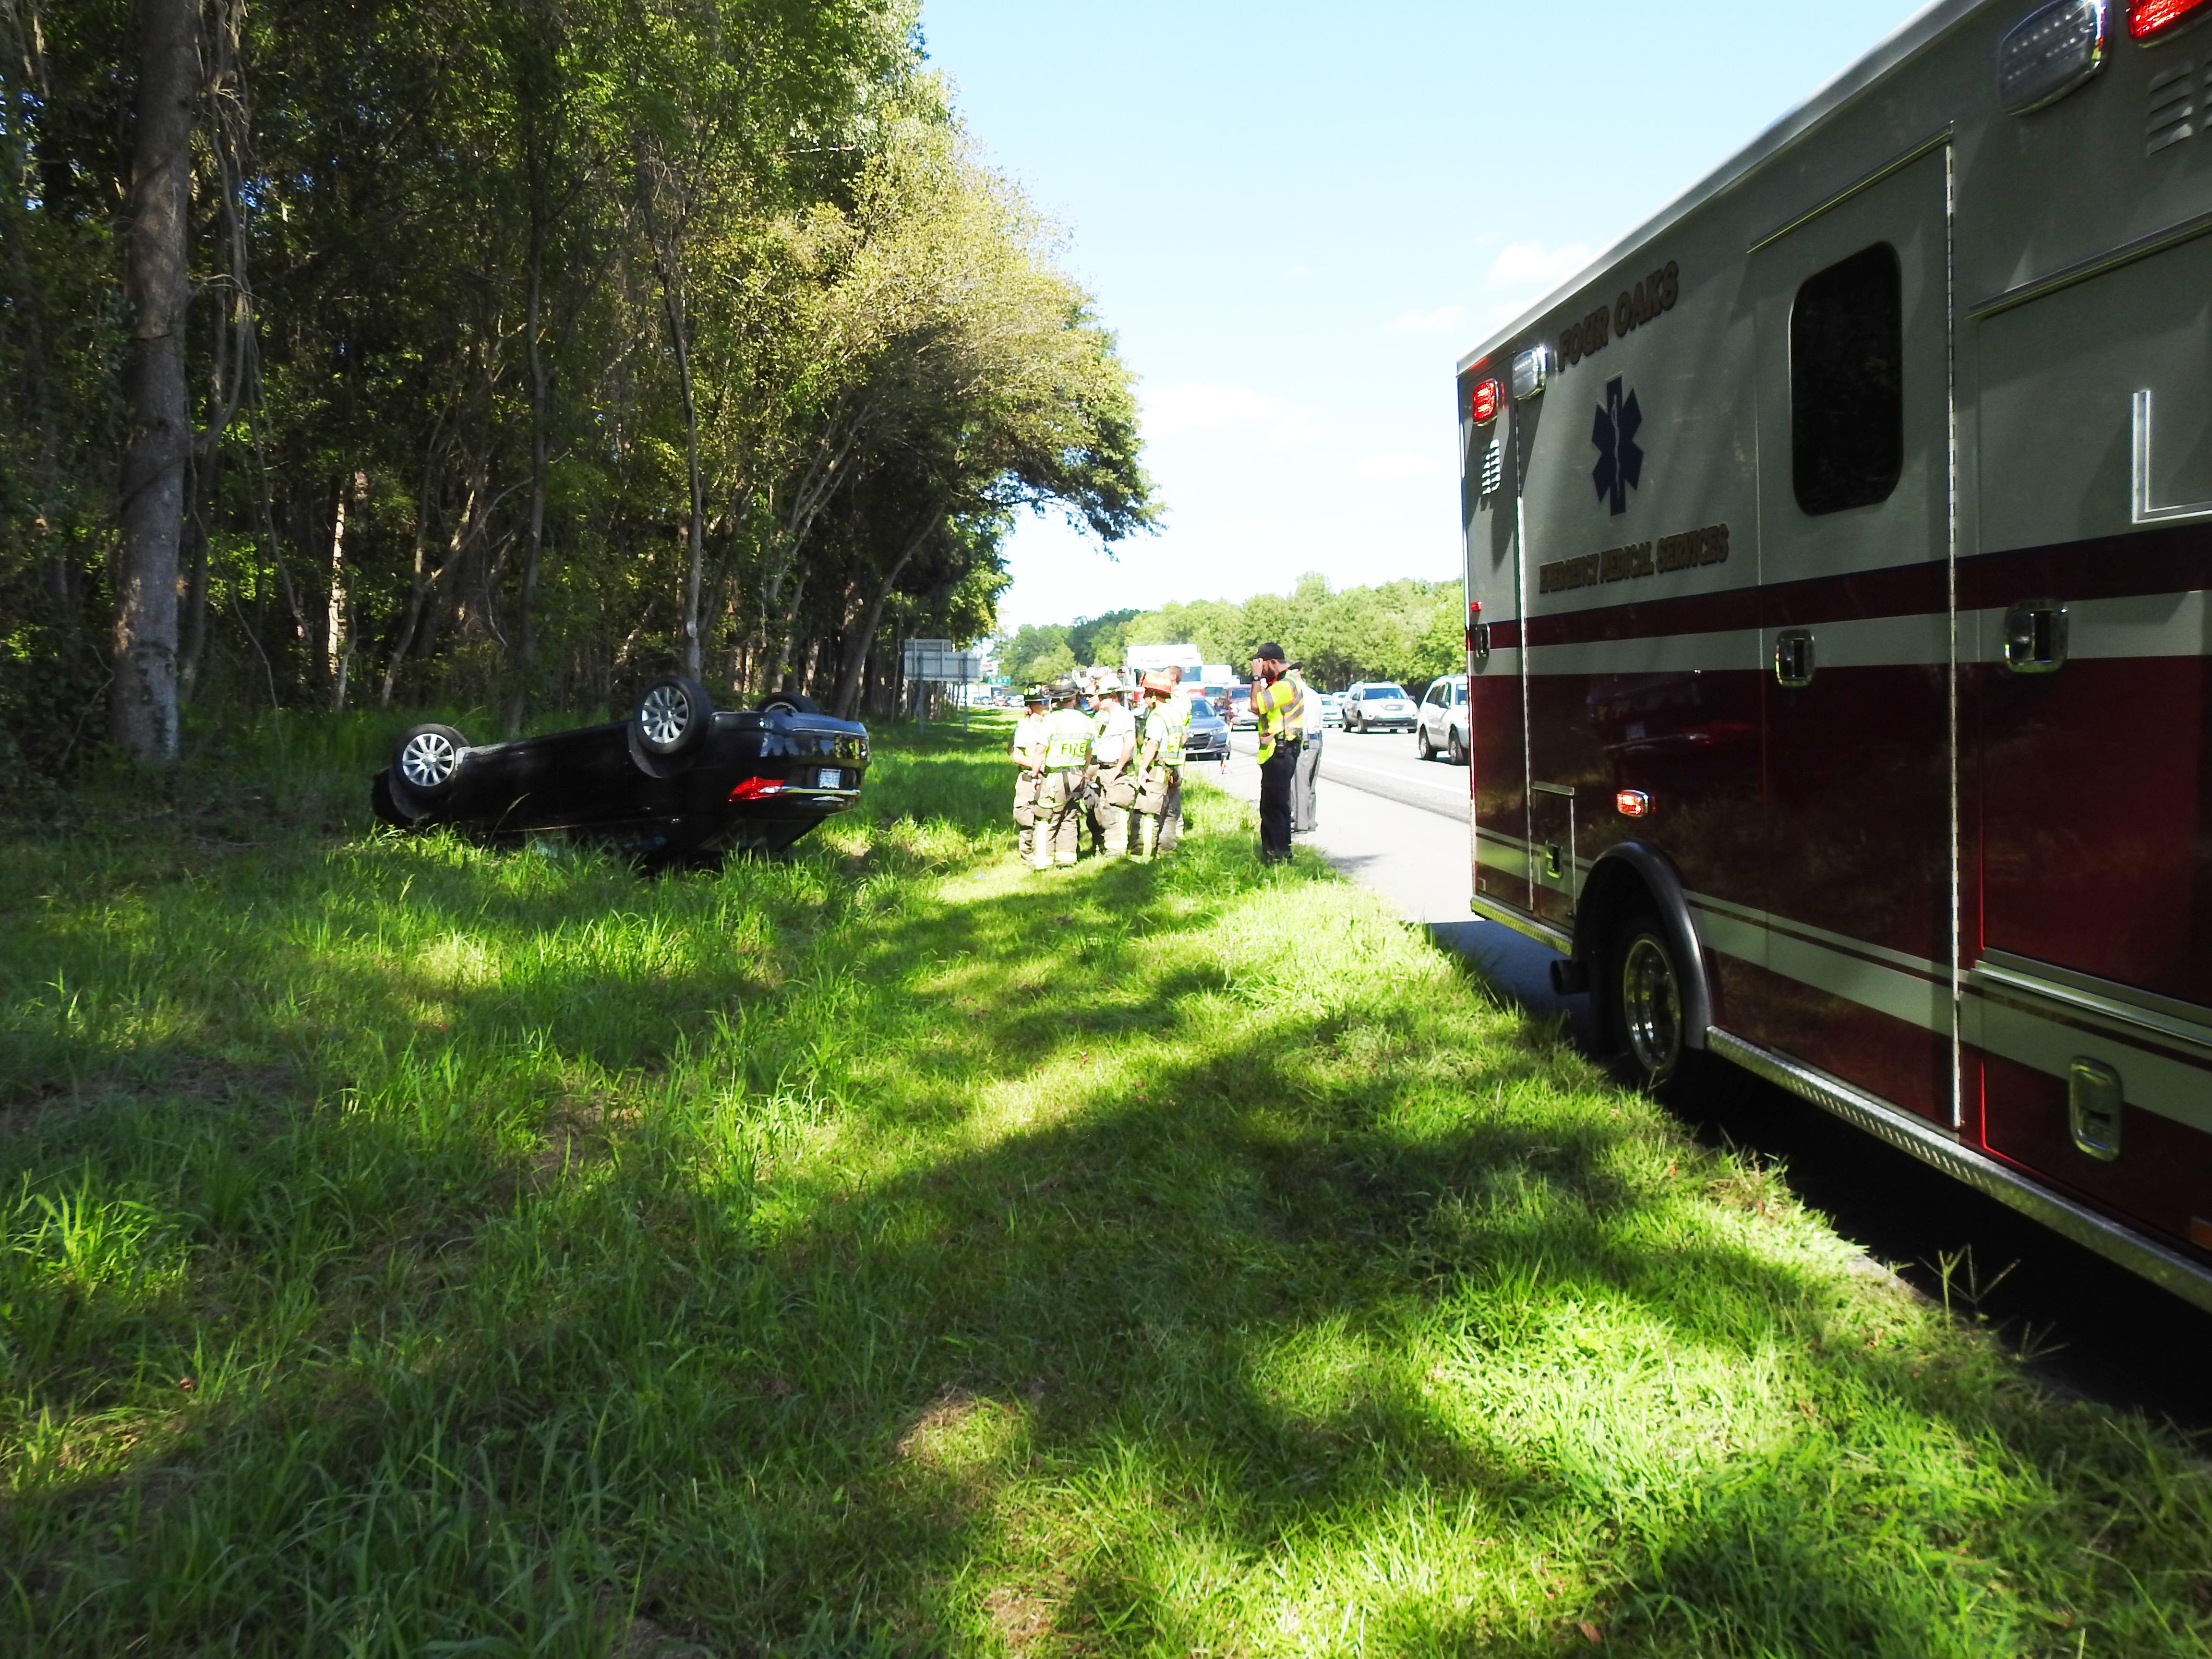 Accident Causes Delays On I-95 – JoCo Report